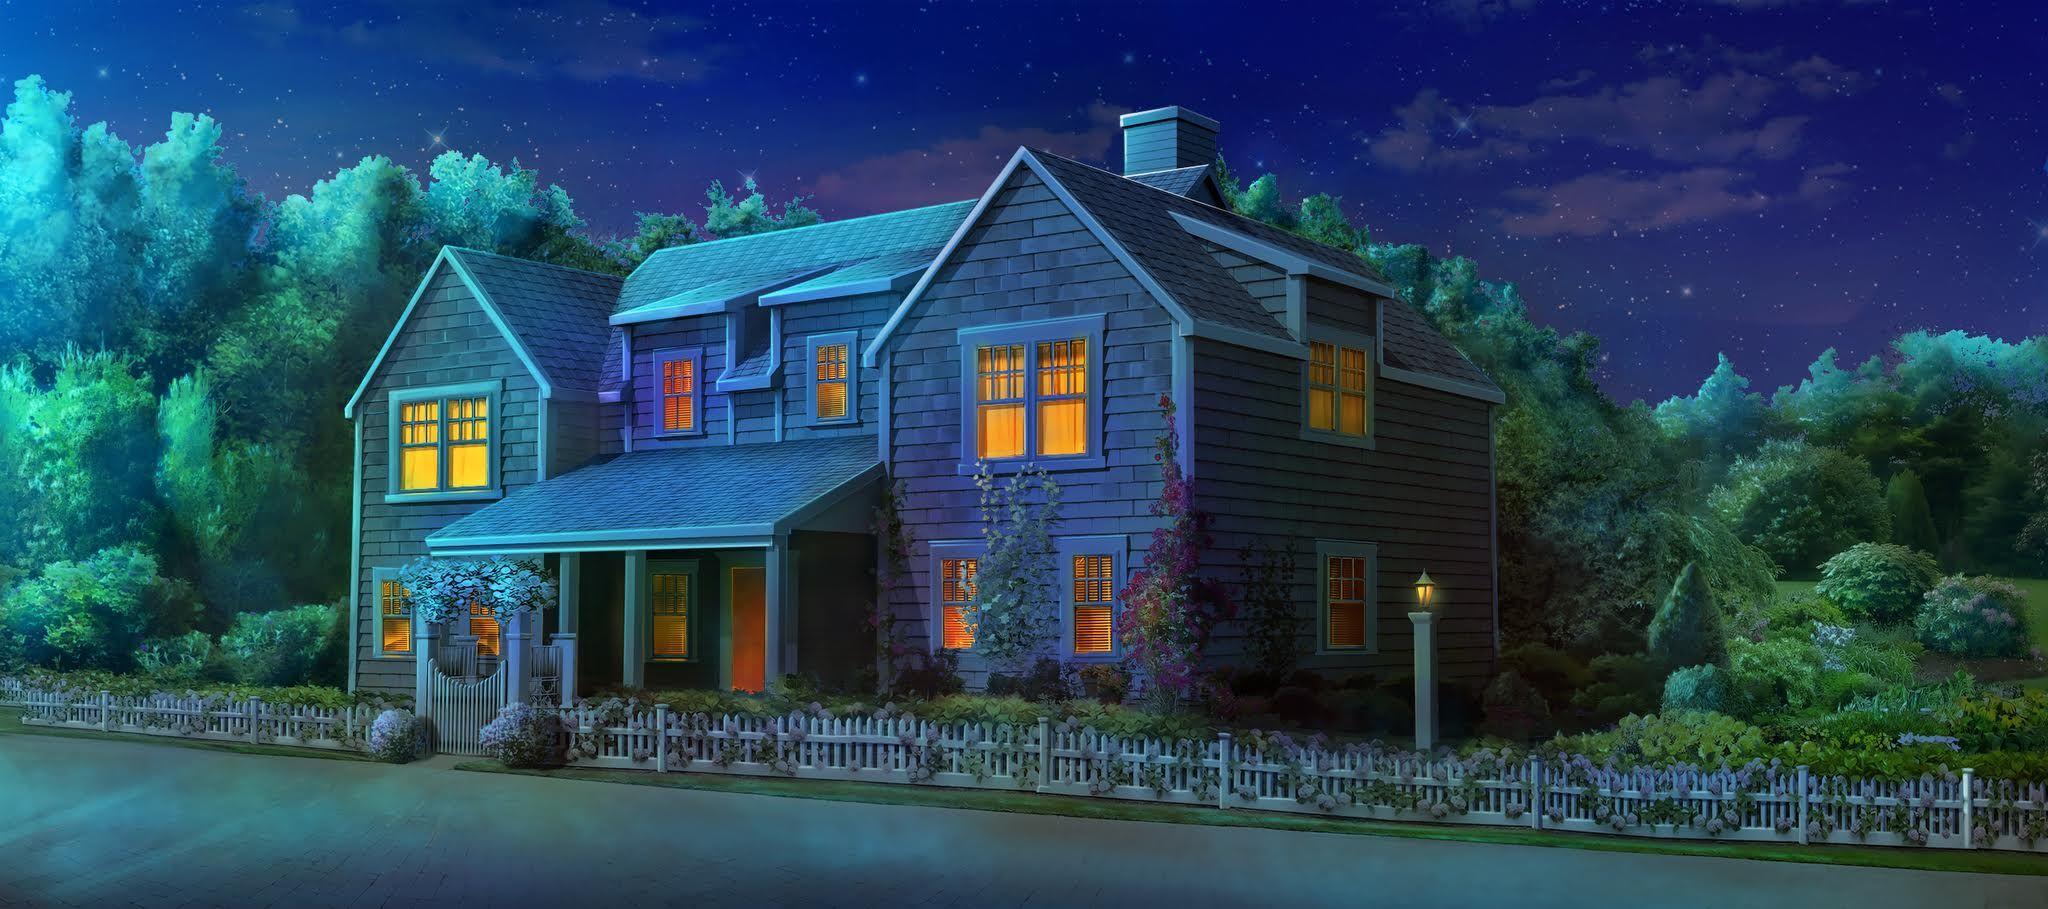 ext bristols house night episode hidden backgrounds